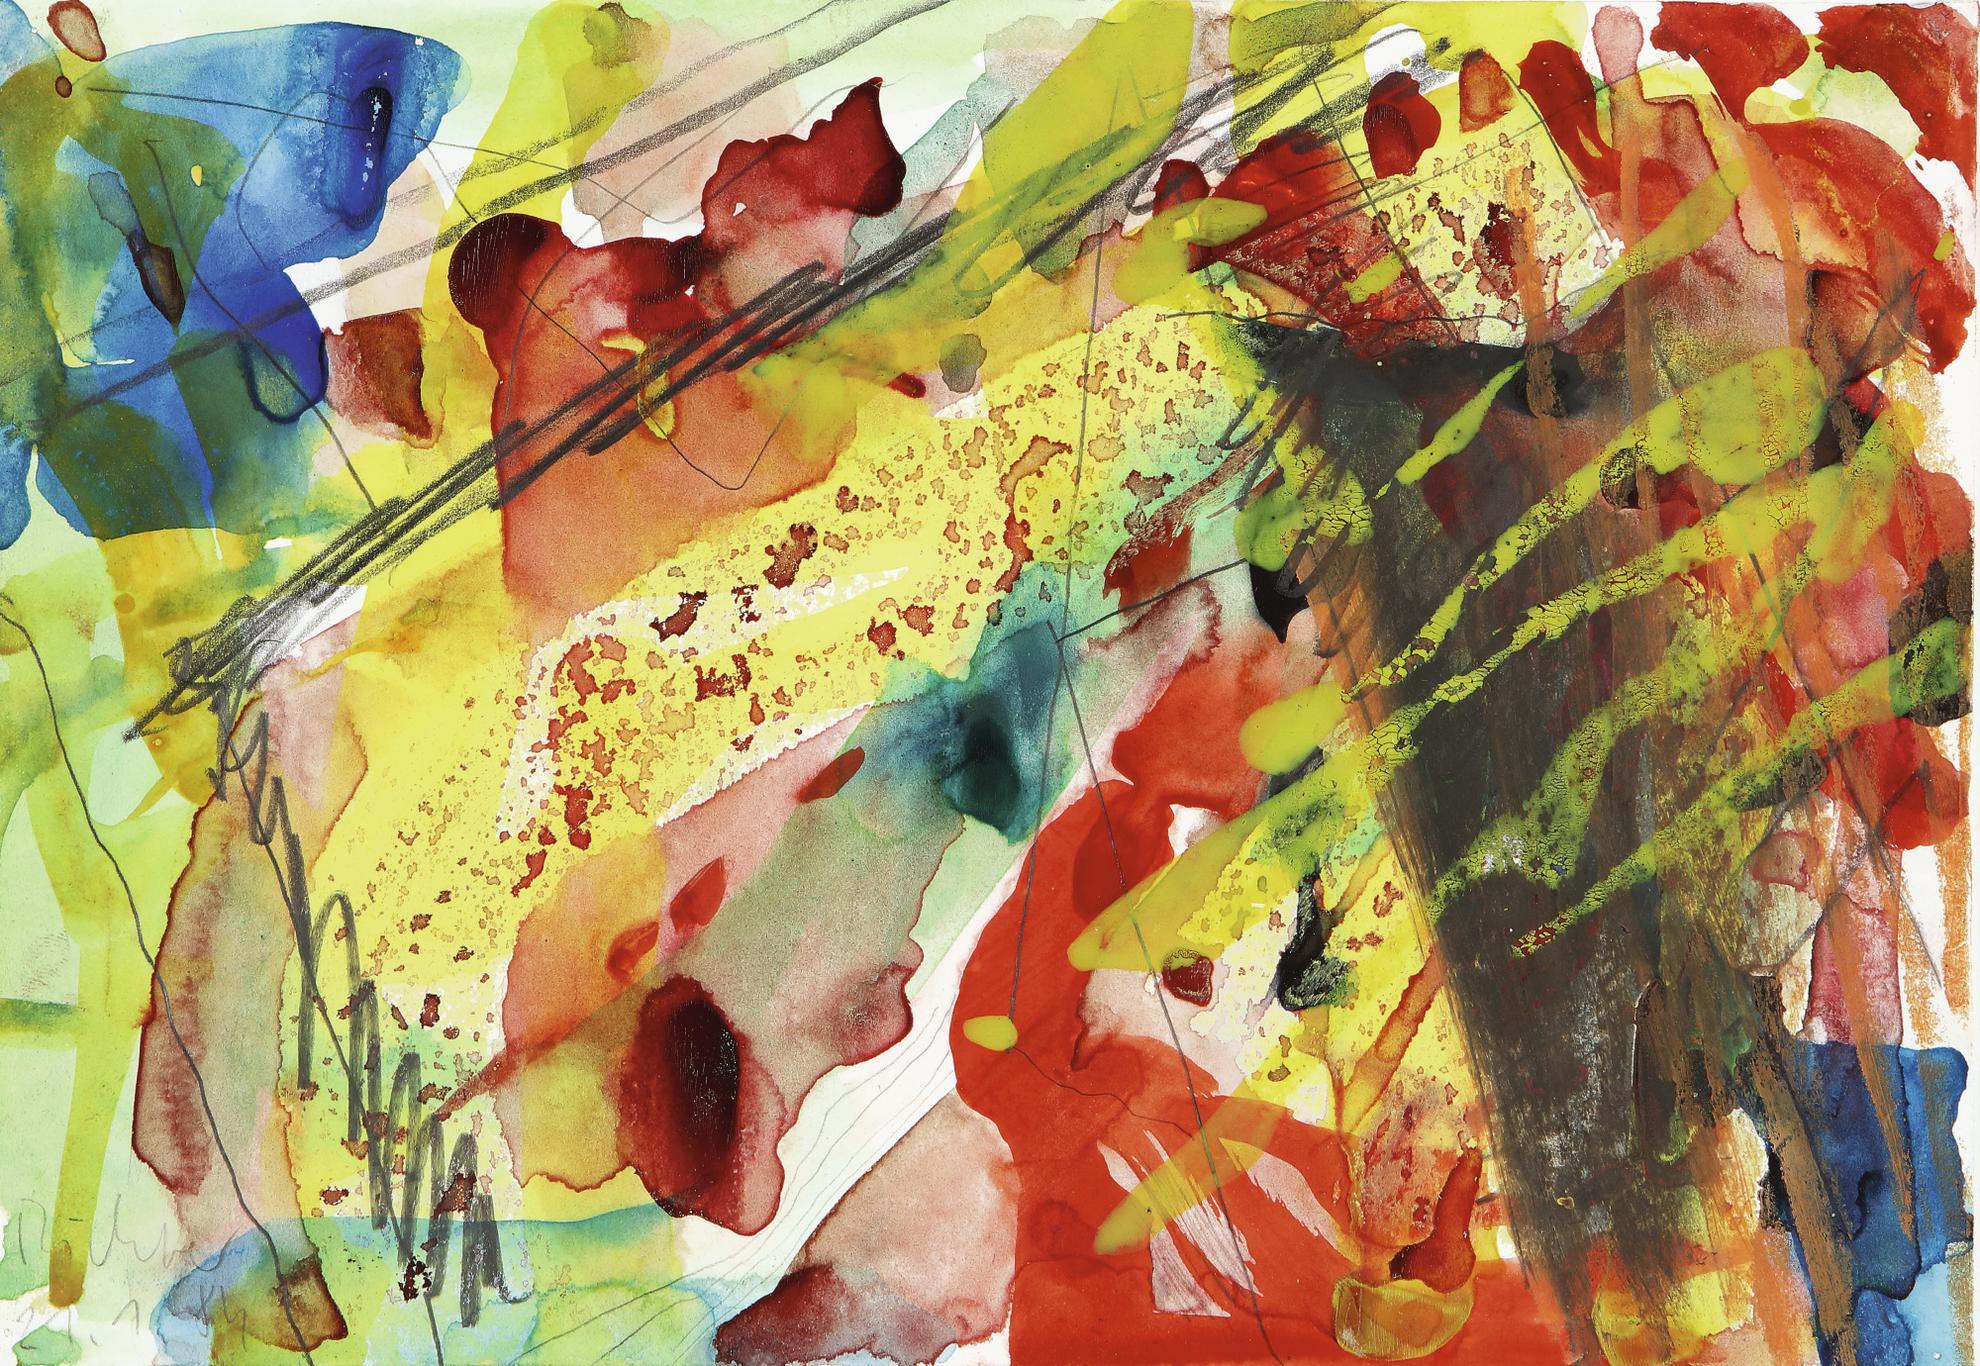 Gerhard Richter-G. El. 4, 21.4.84-1984